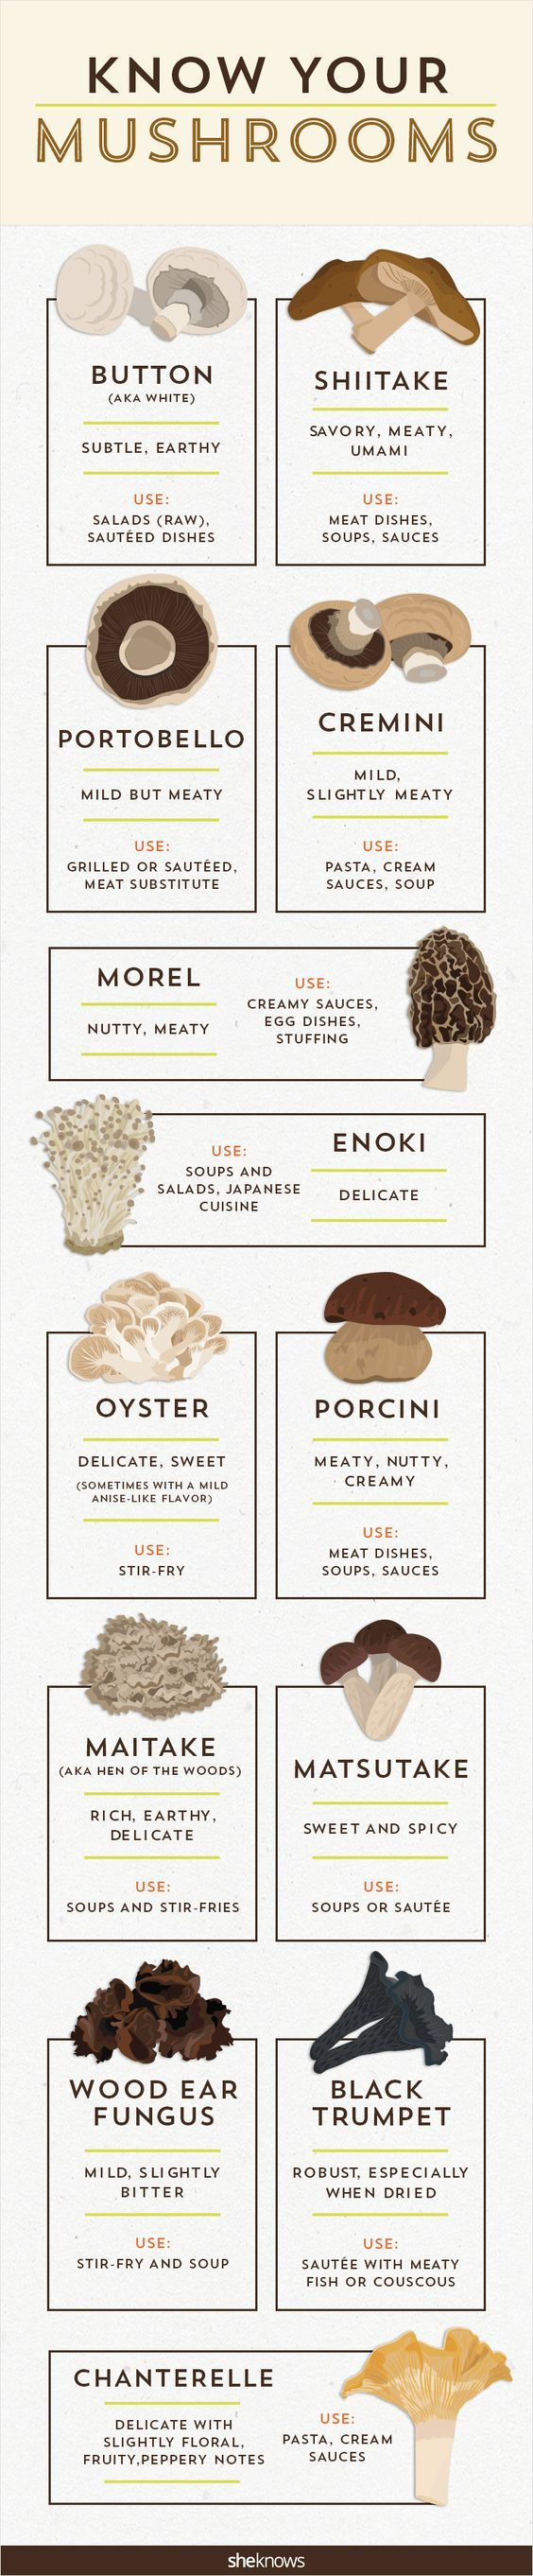 Know Your Mushroom - http://explo.in/28SAU09 #Bangalore #Restaurants